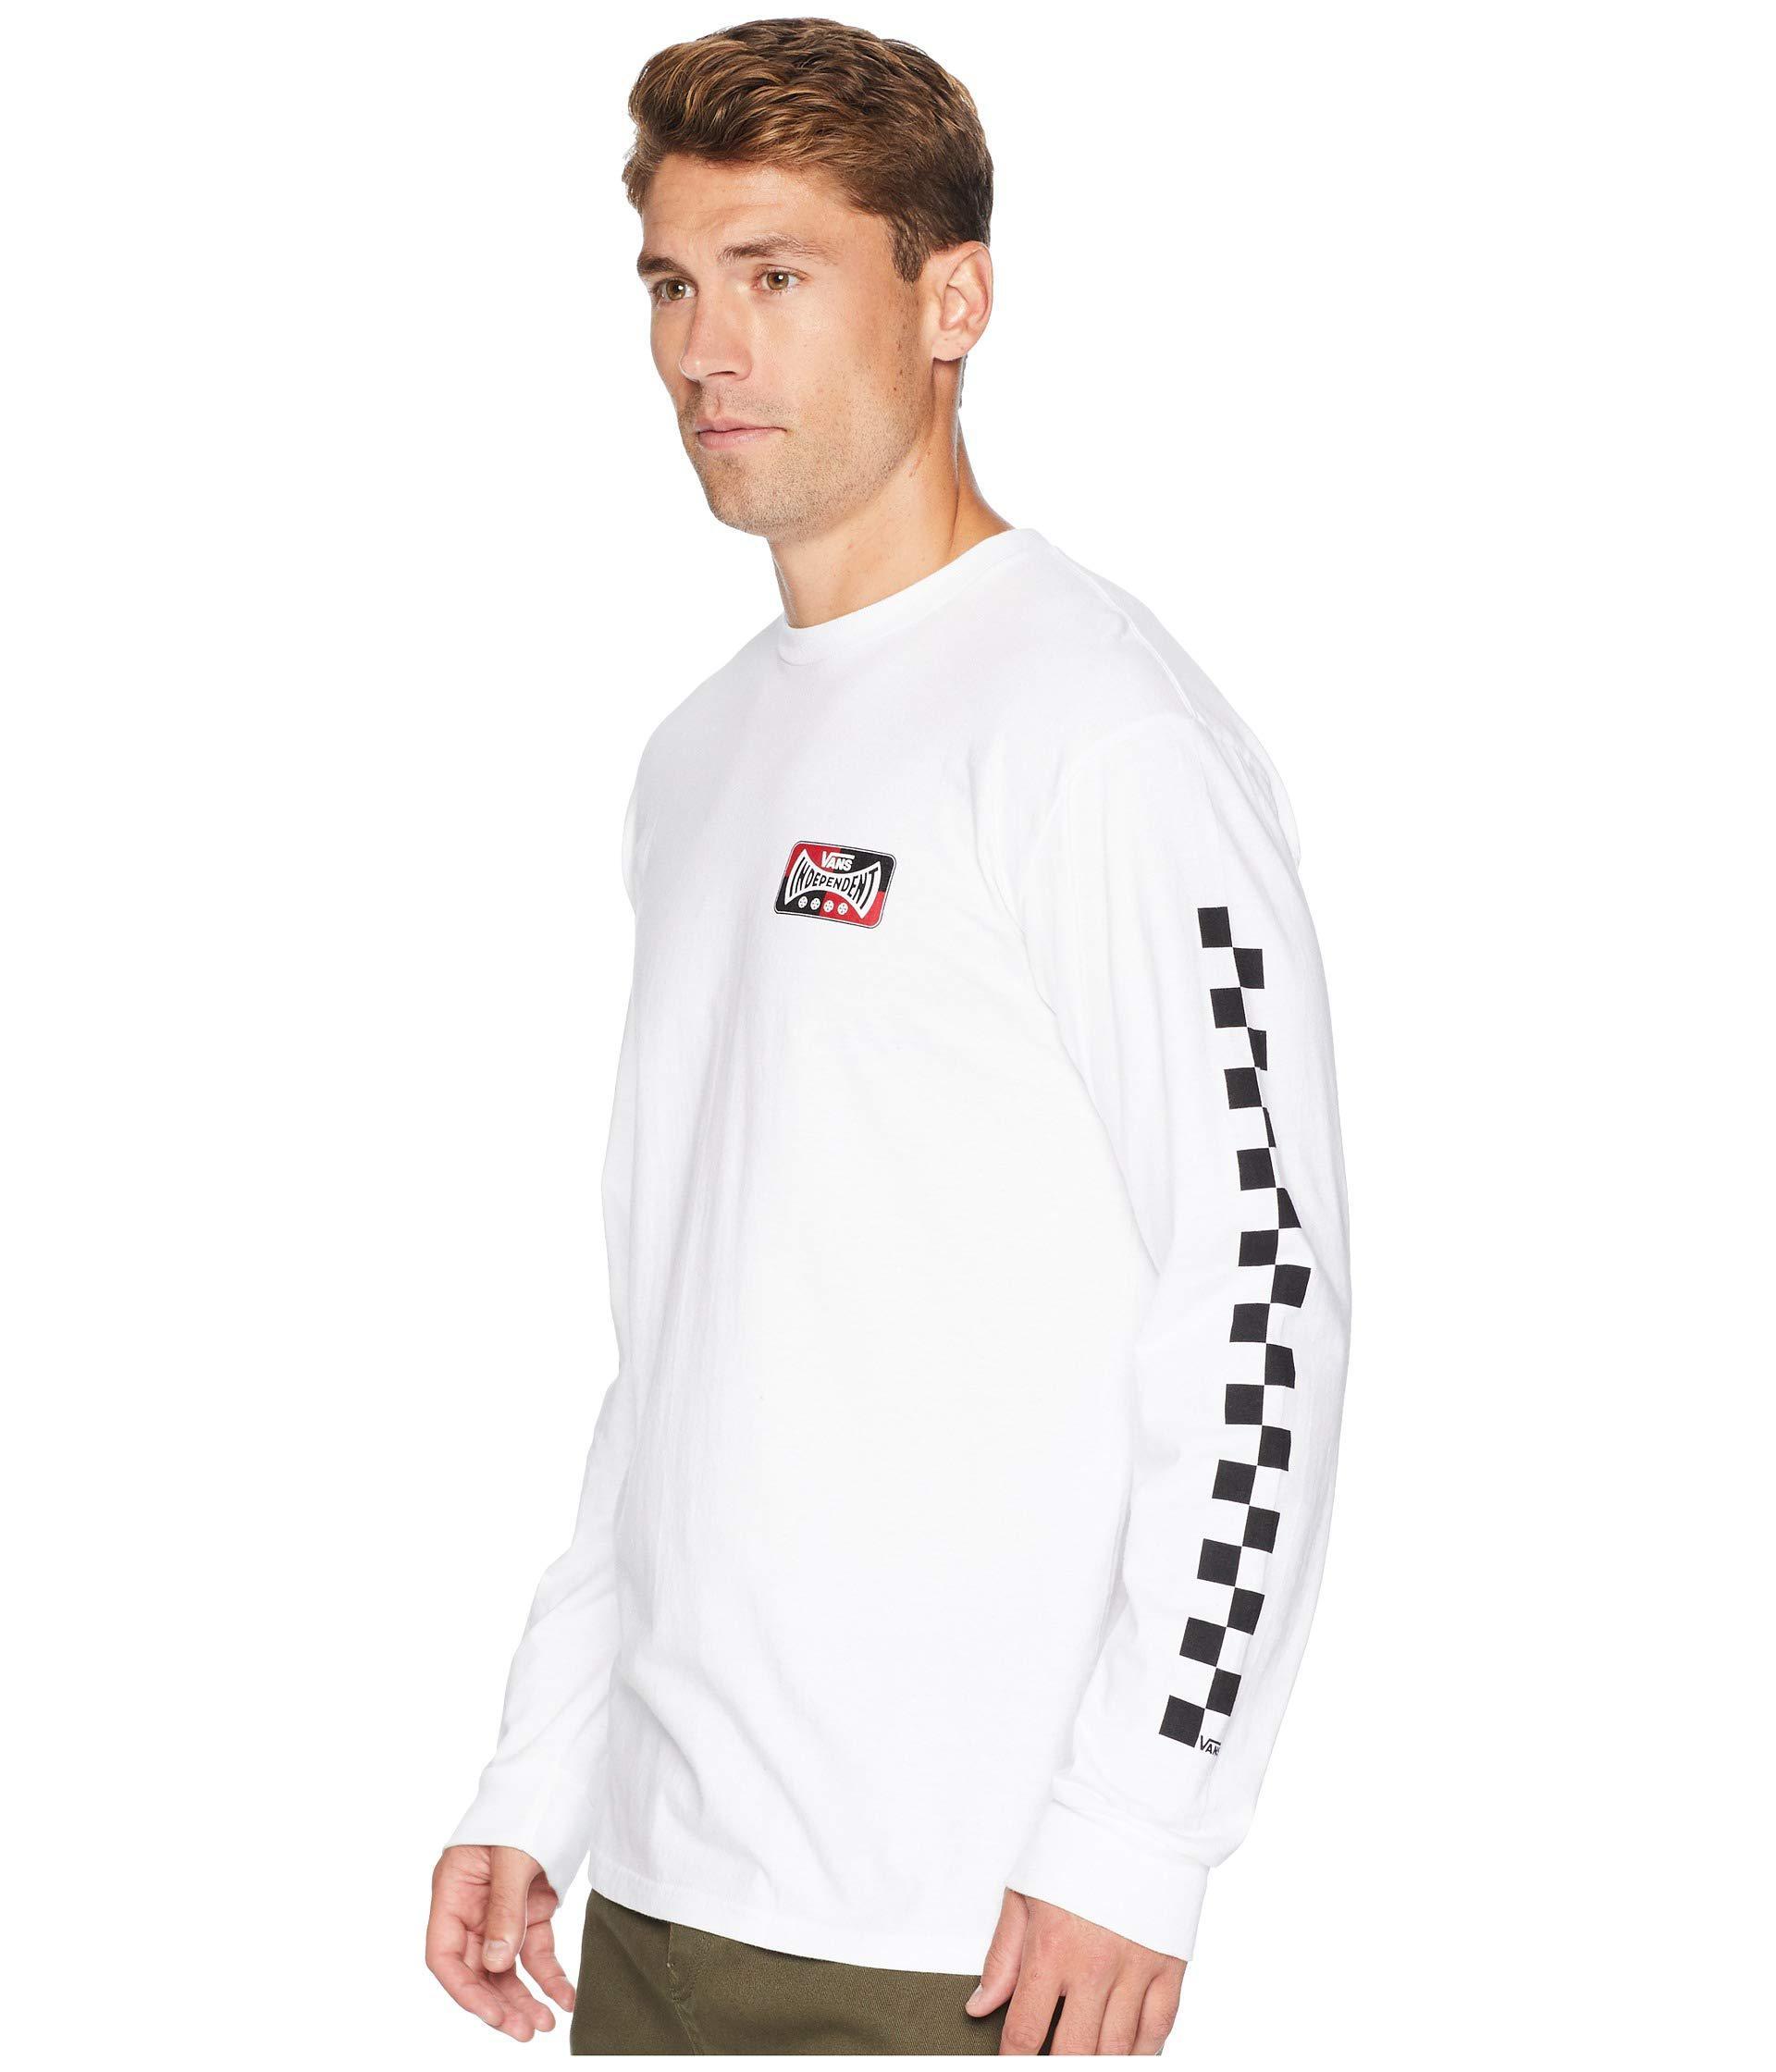 f4303129a Vans X Independent Long Sleeve T-shirt (white) Men's T Shirt in ...